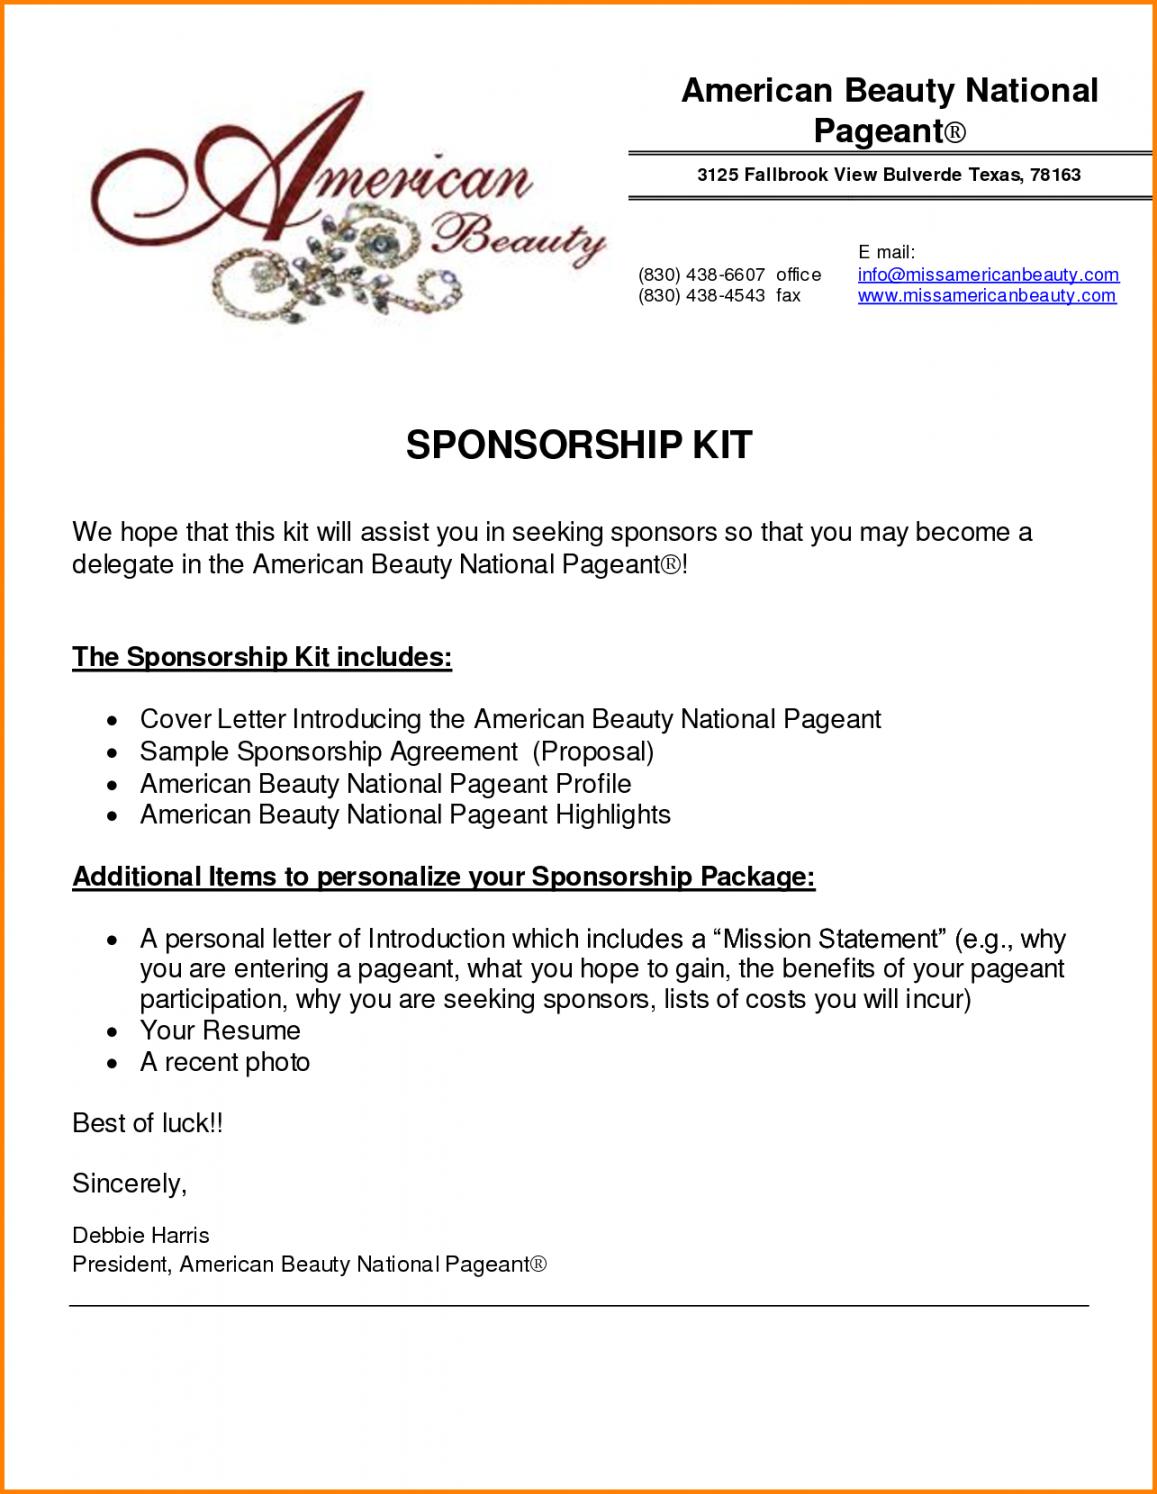 Corporate Sponsorship Proposal Template Inside Corporate Sponsorship Proposal Template